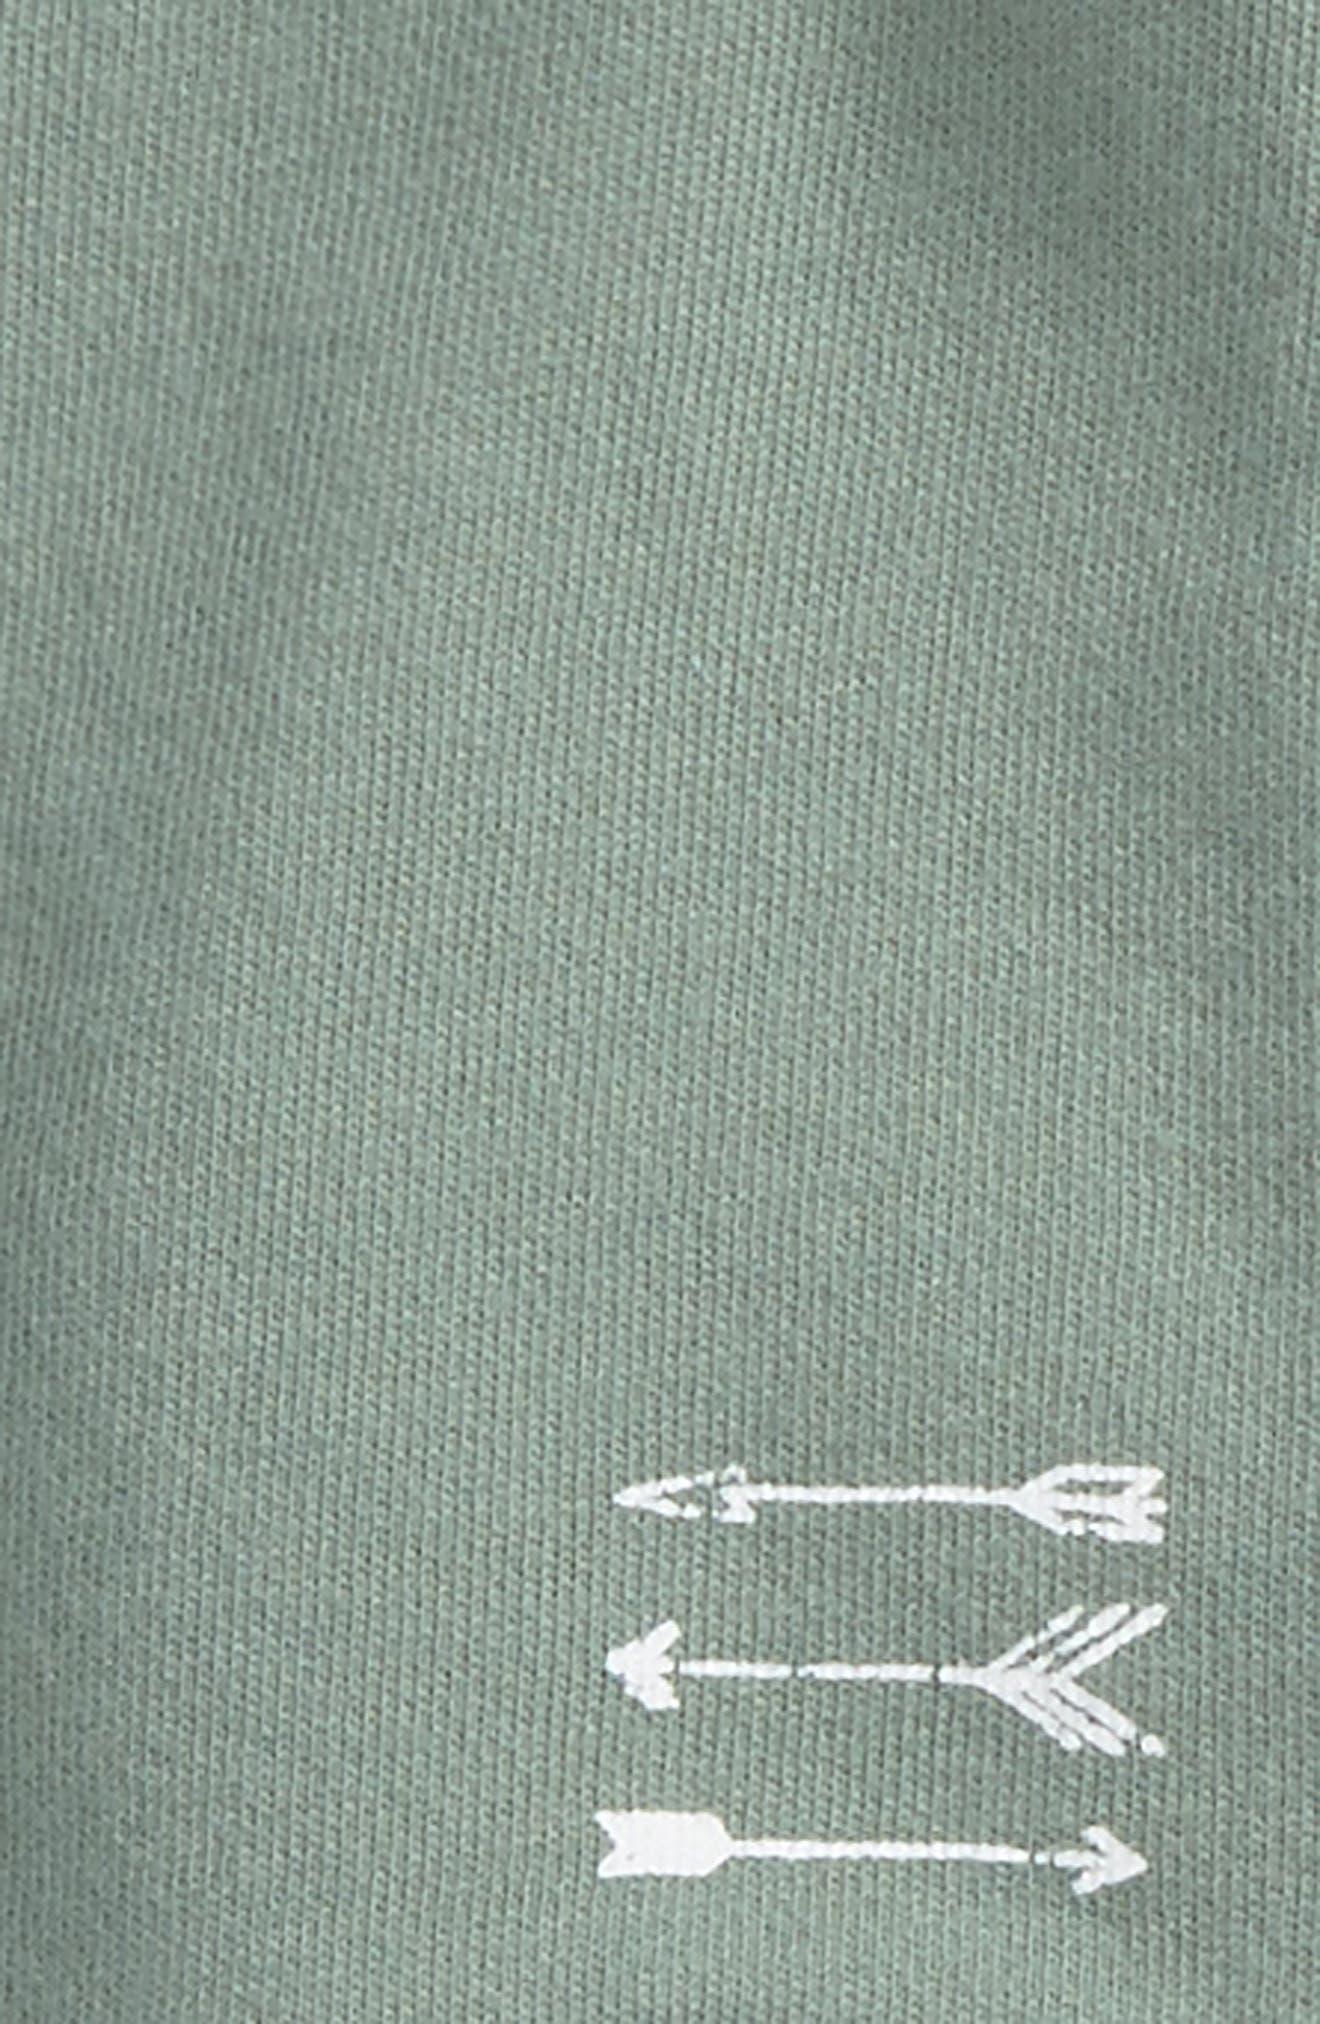 Alternate Image 2  - Splendid Sweatshirt & Stripe Pants Set (Baby Boys)